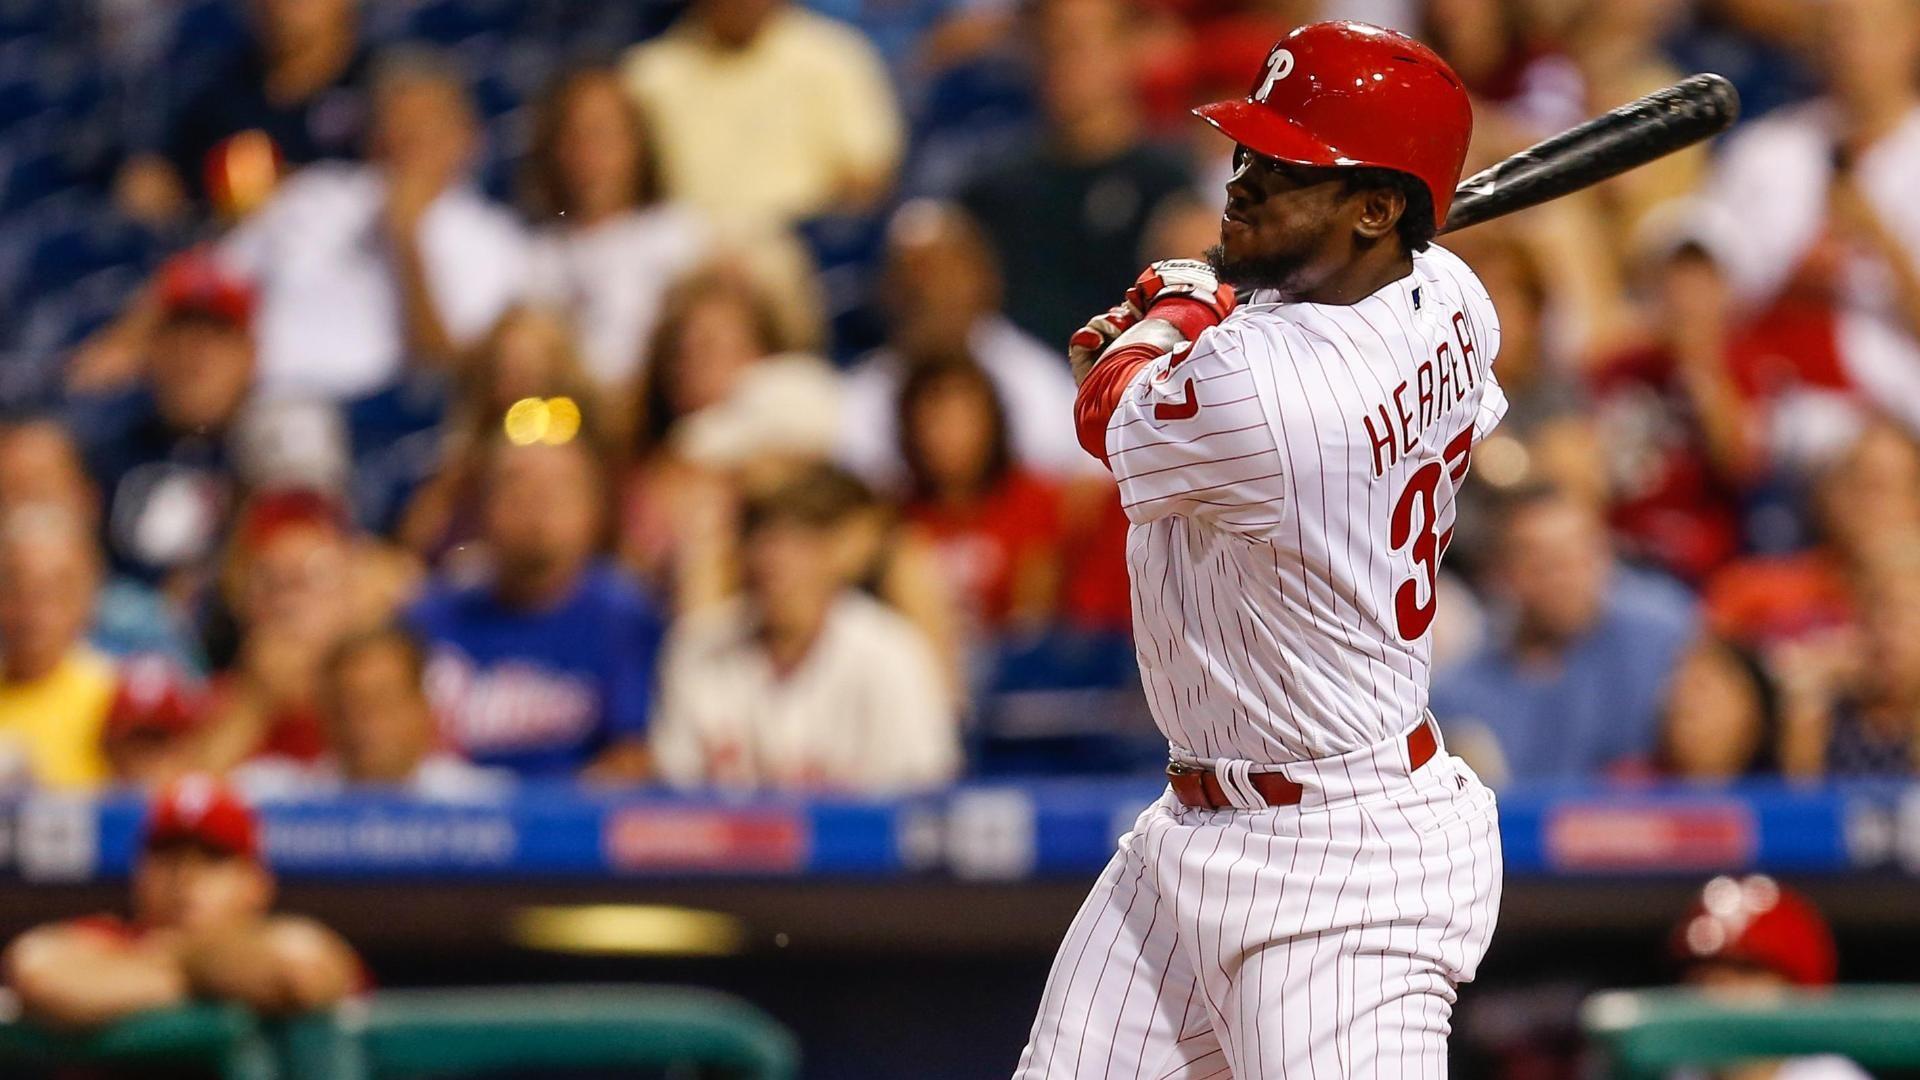 Herrera's two-run rocket puts Phillies on the board